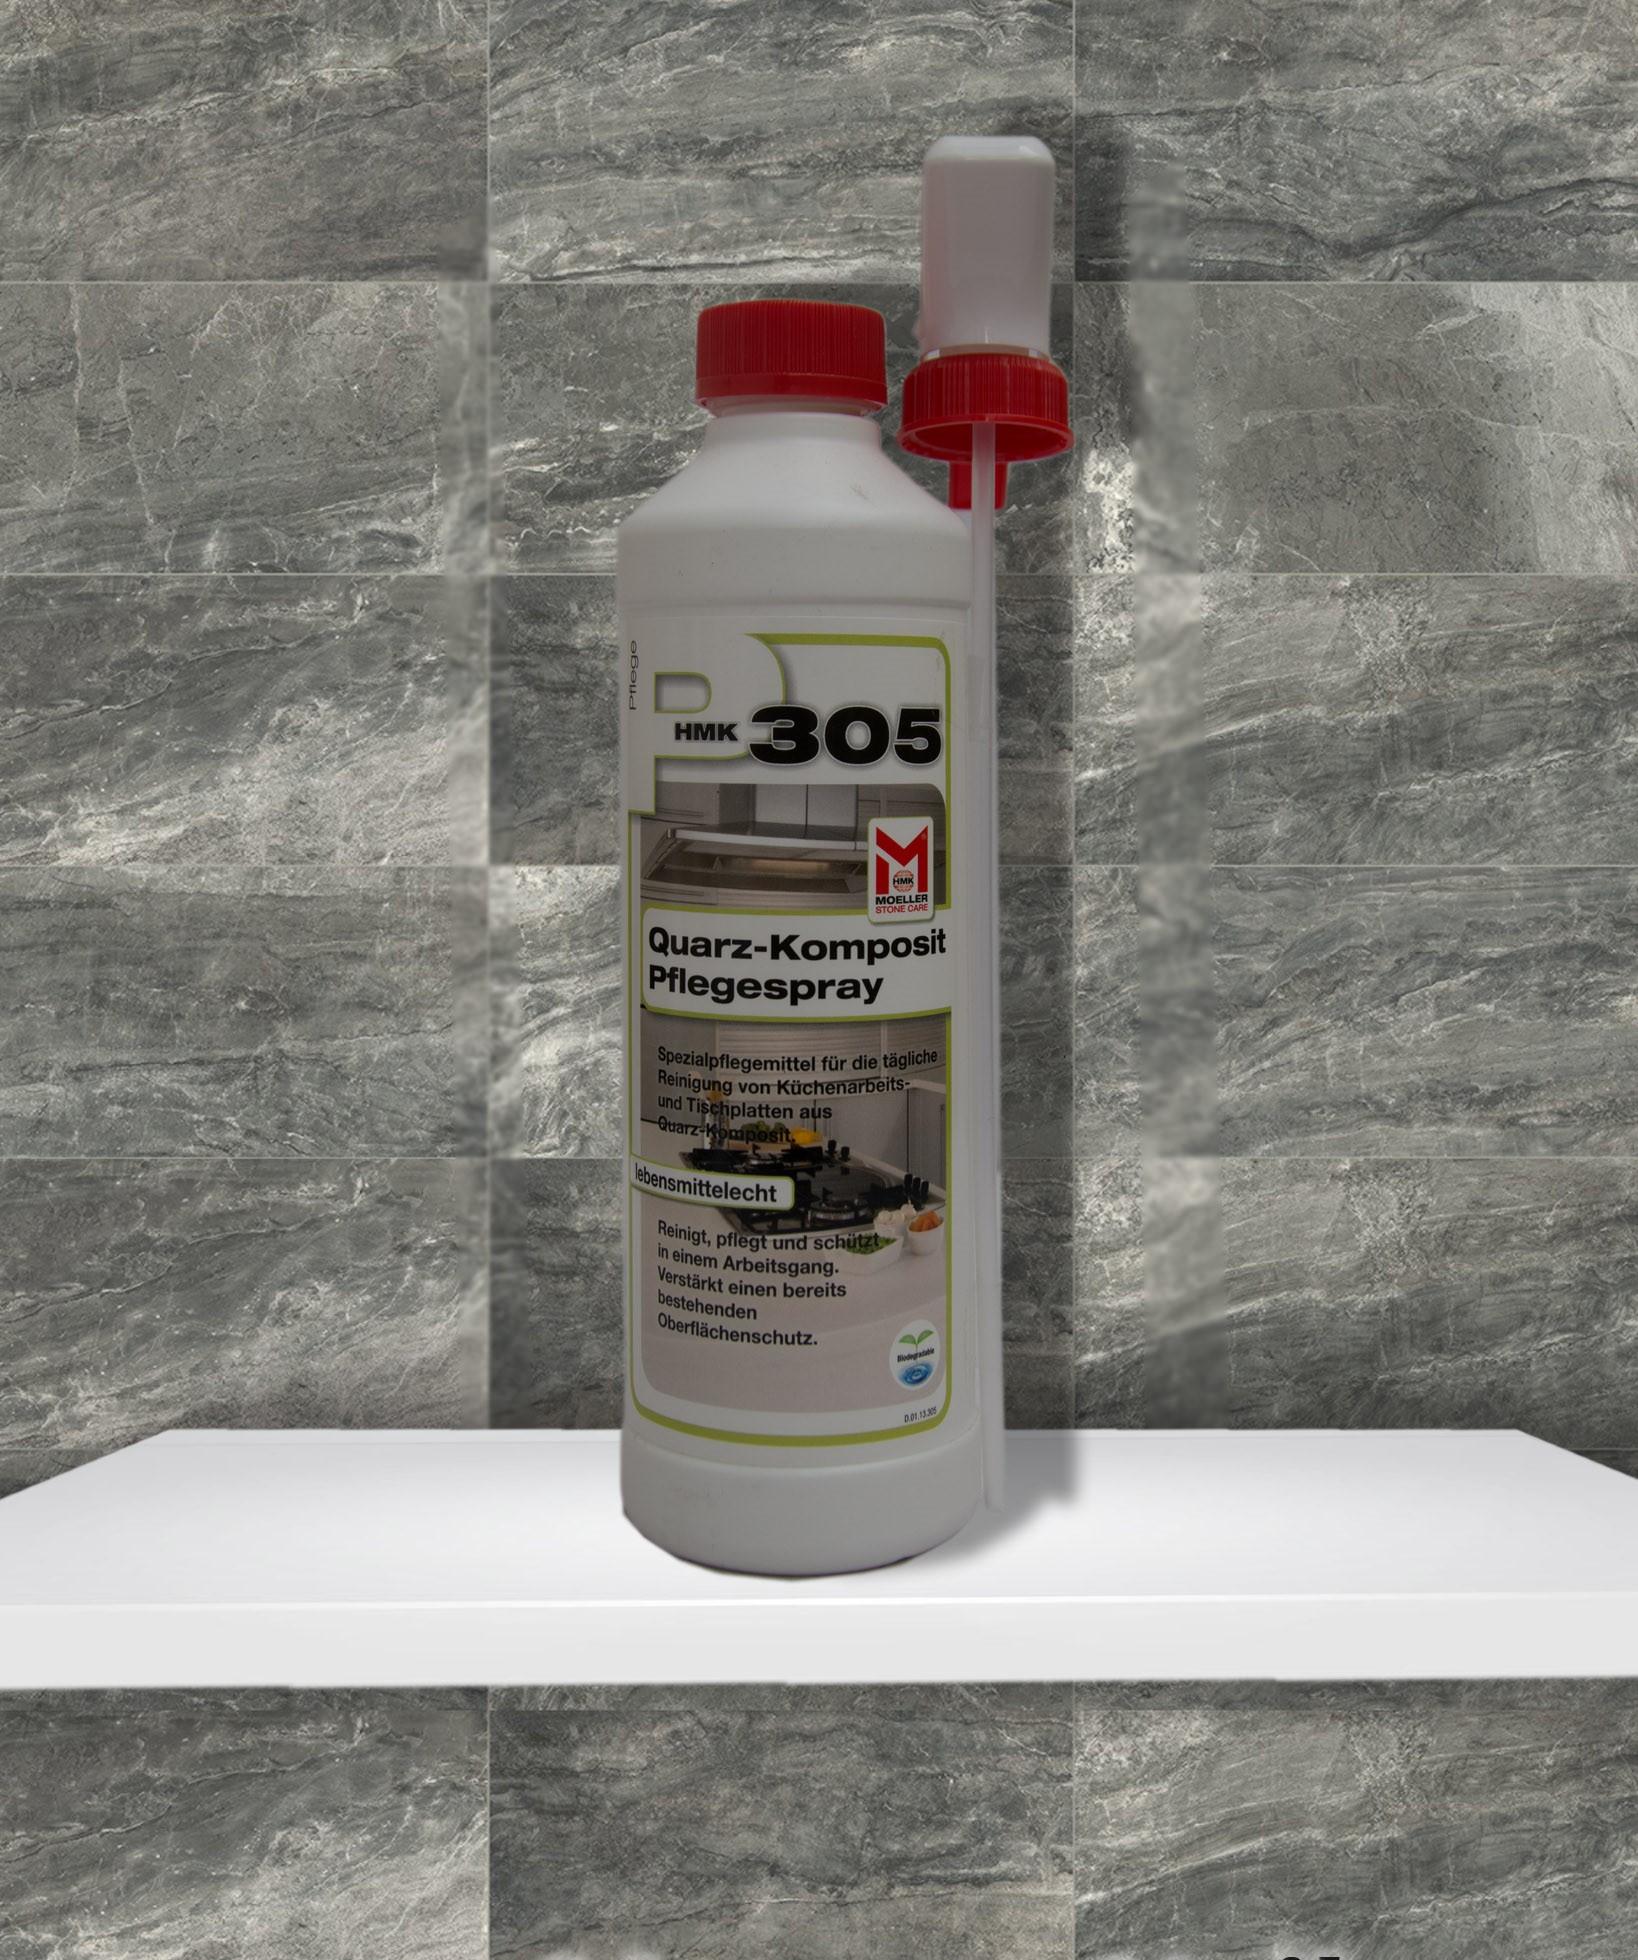 HMK P305 Quarz-Komposit Pflegespray 500ml